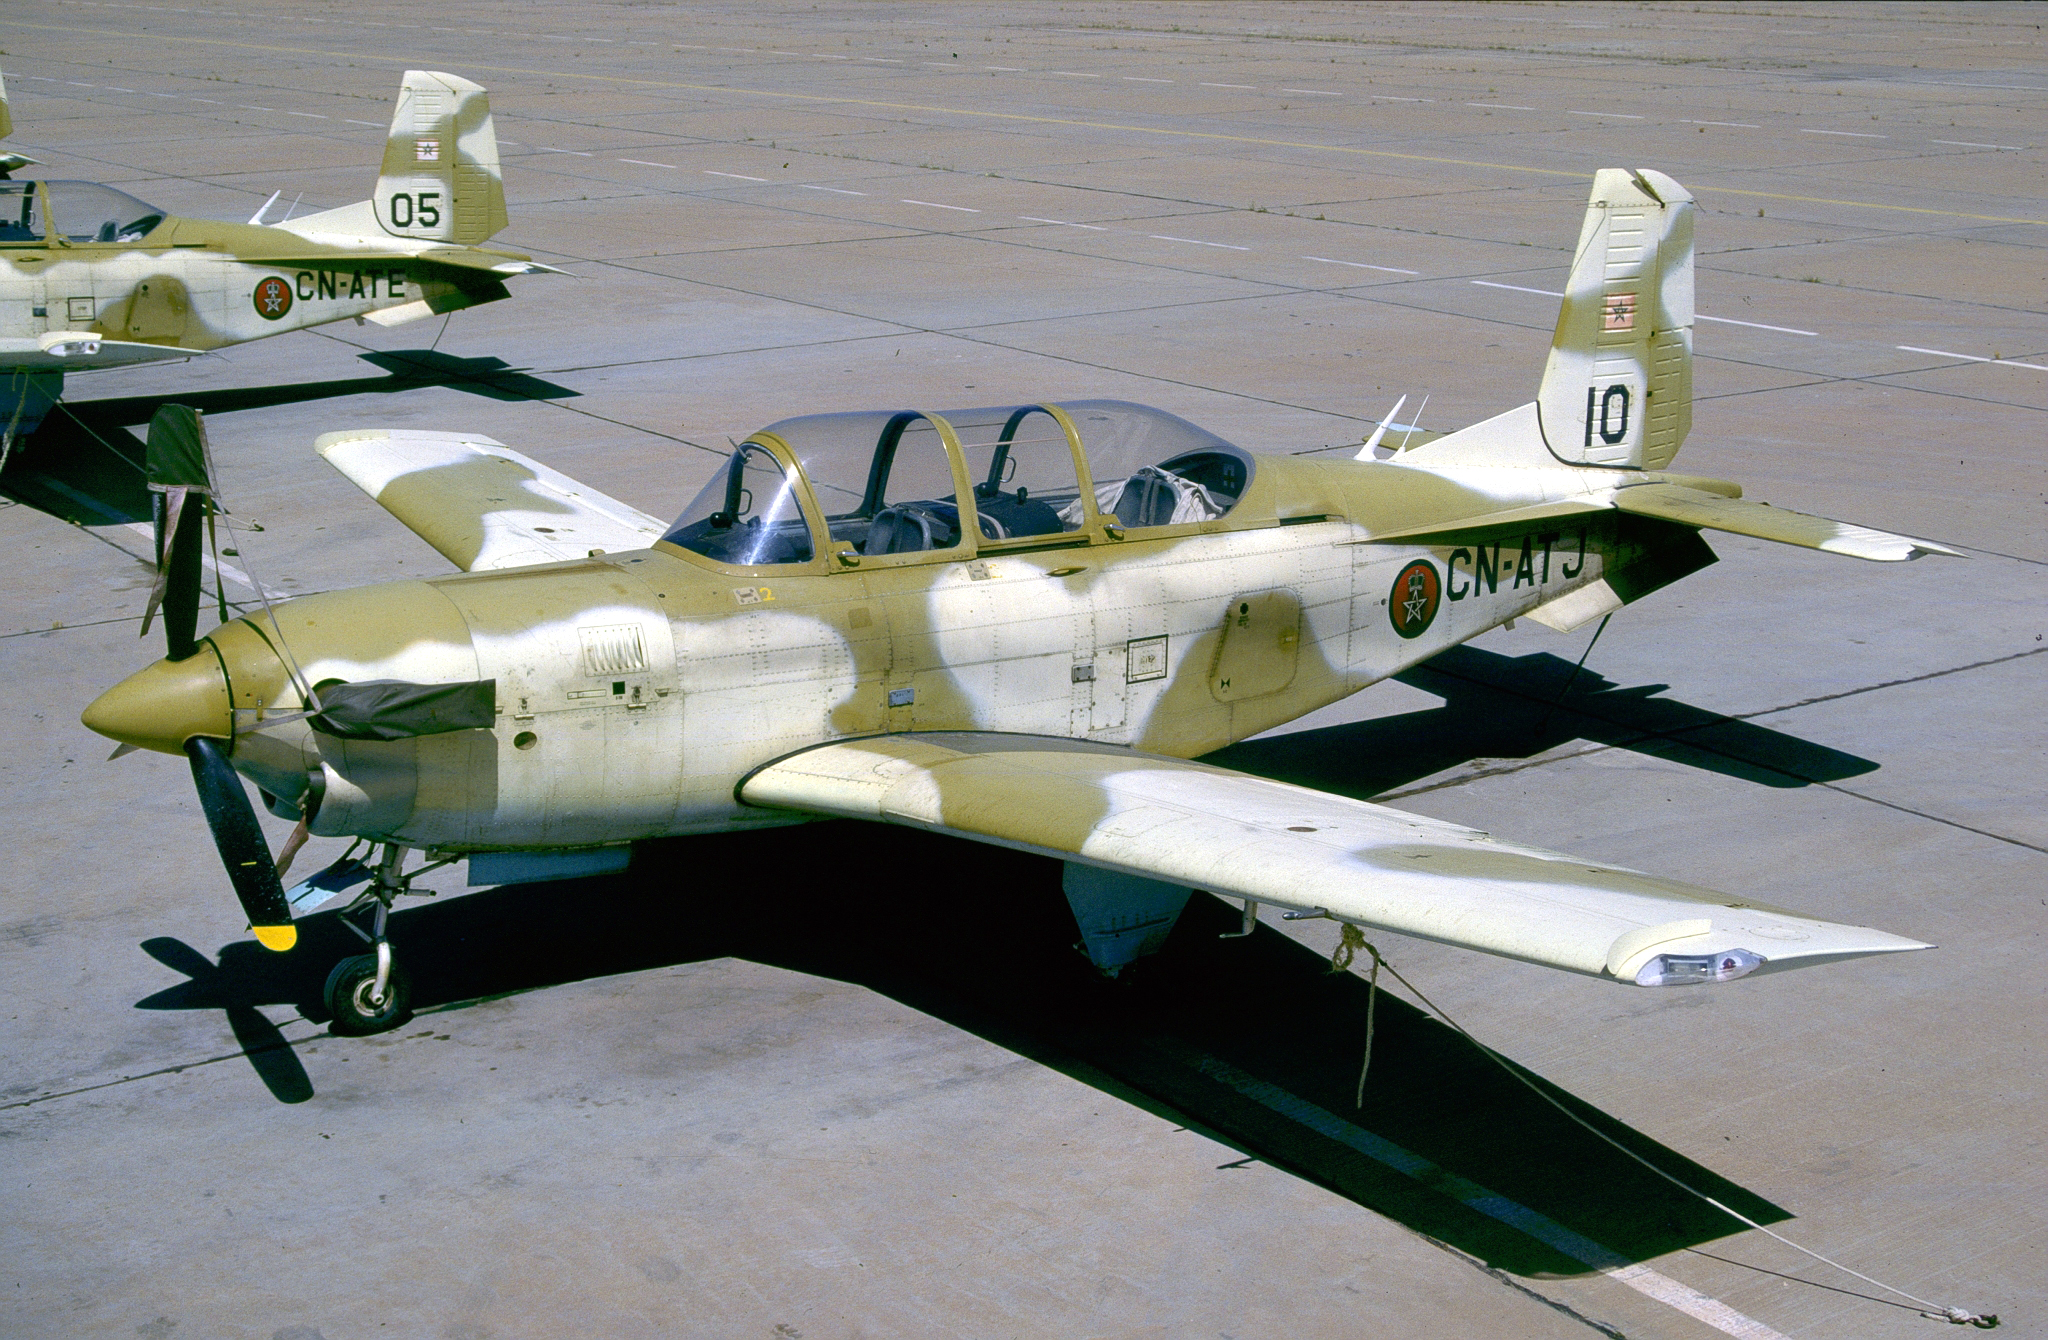 FRA: Photos anciens avions des FRA - Page 7 151226025348371849